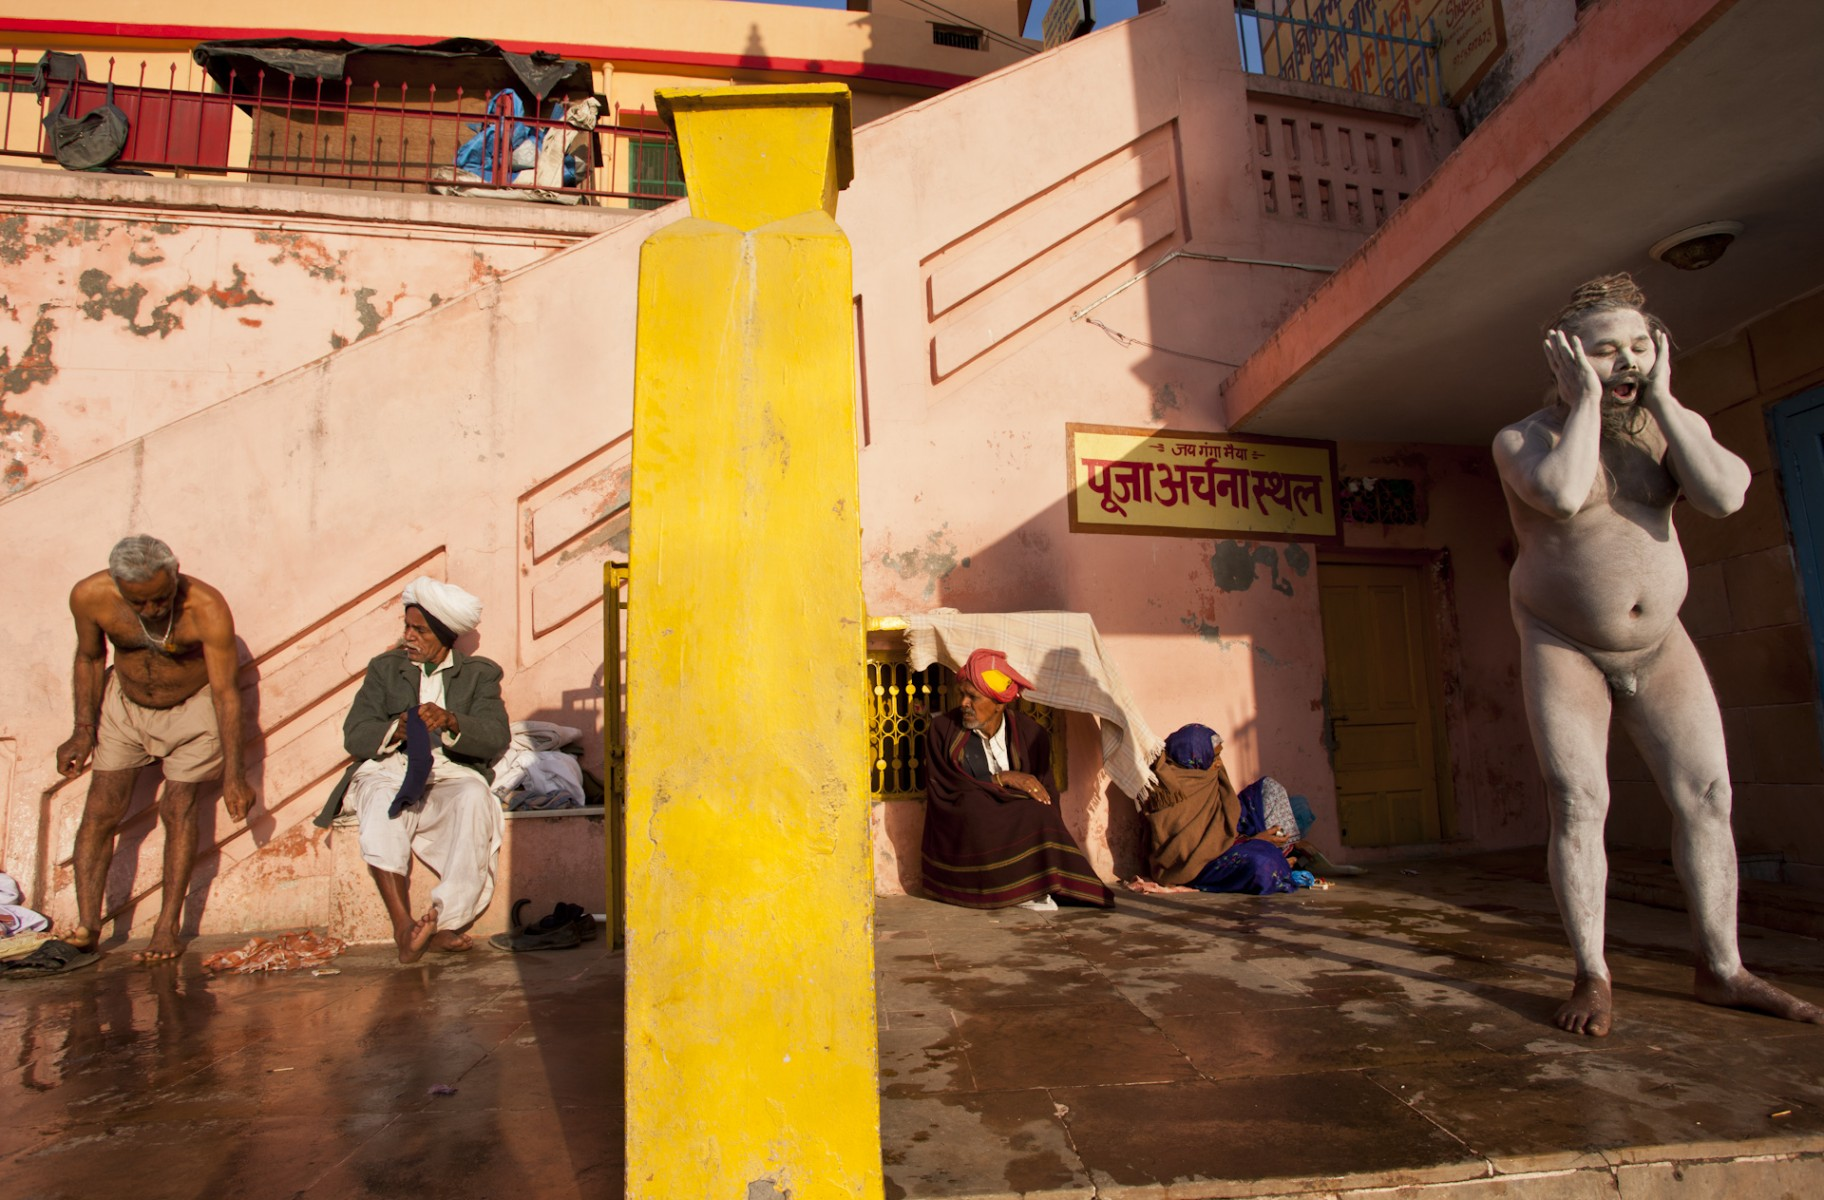 Morning Bathing, Kumbh Mela, Hardwar